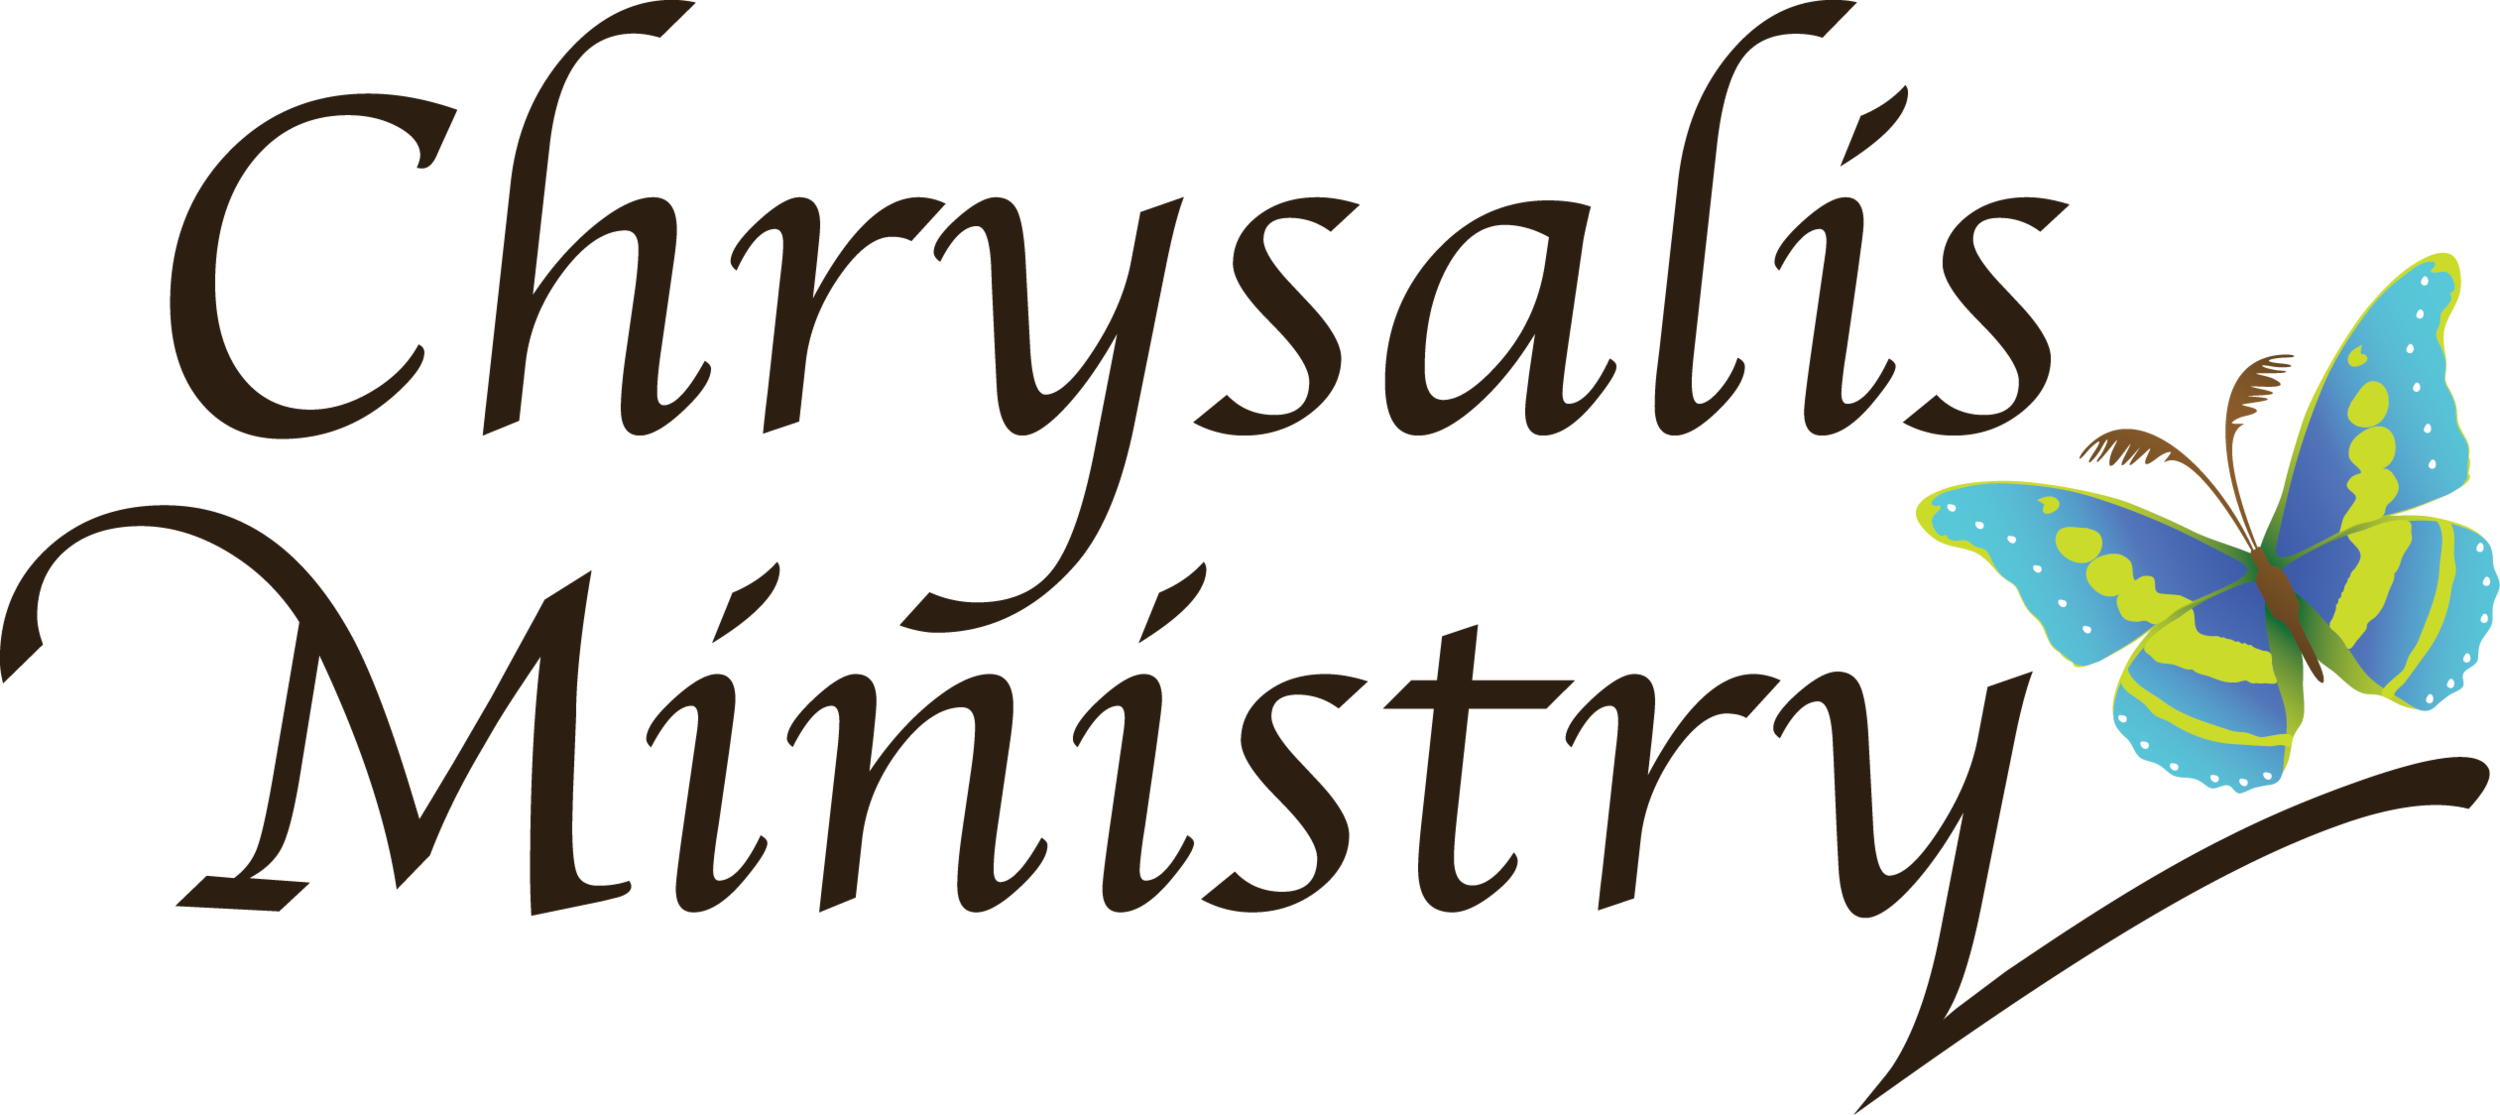 ChrysallisMinistry.png